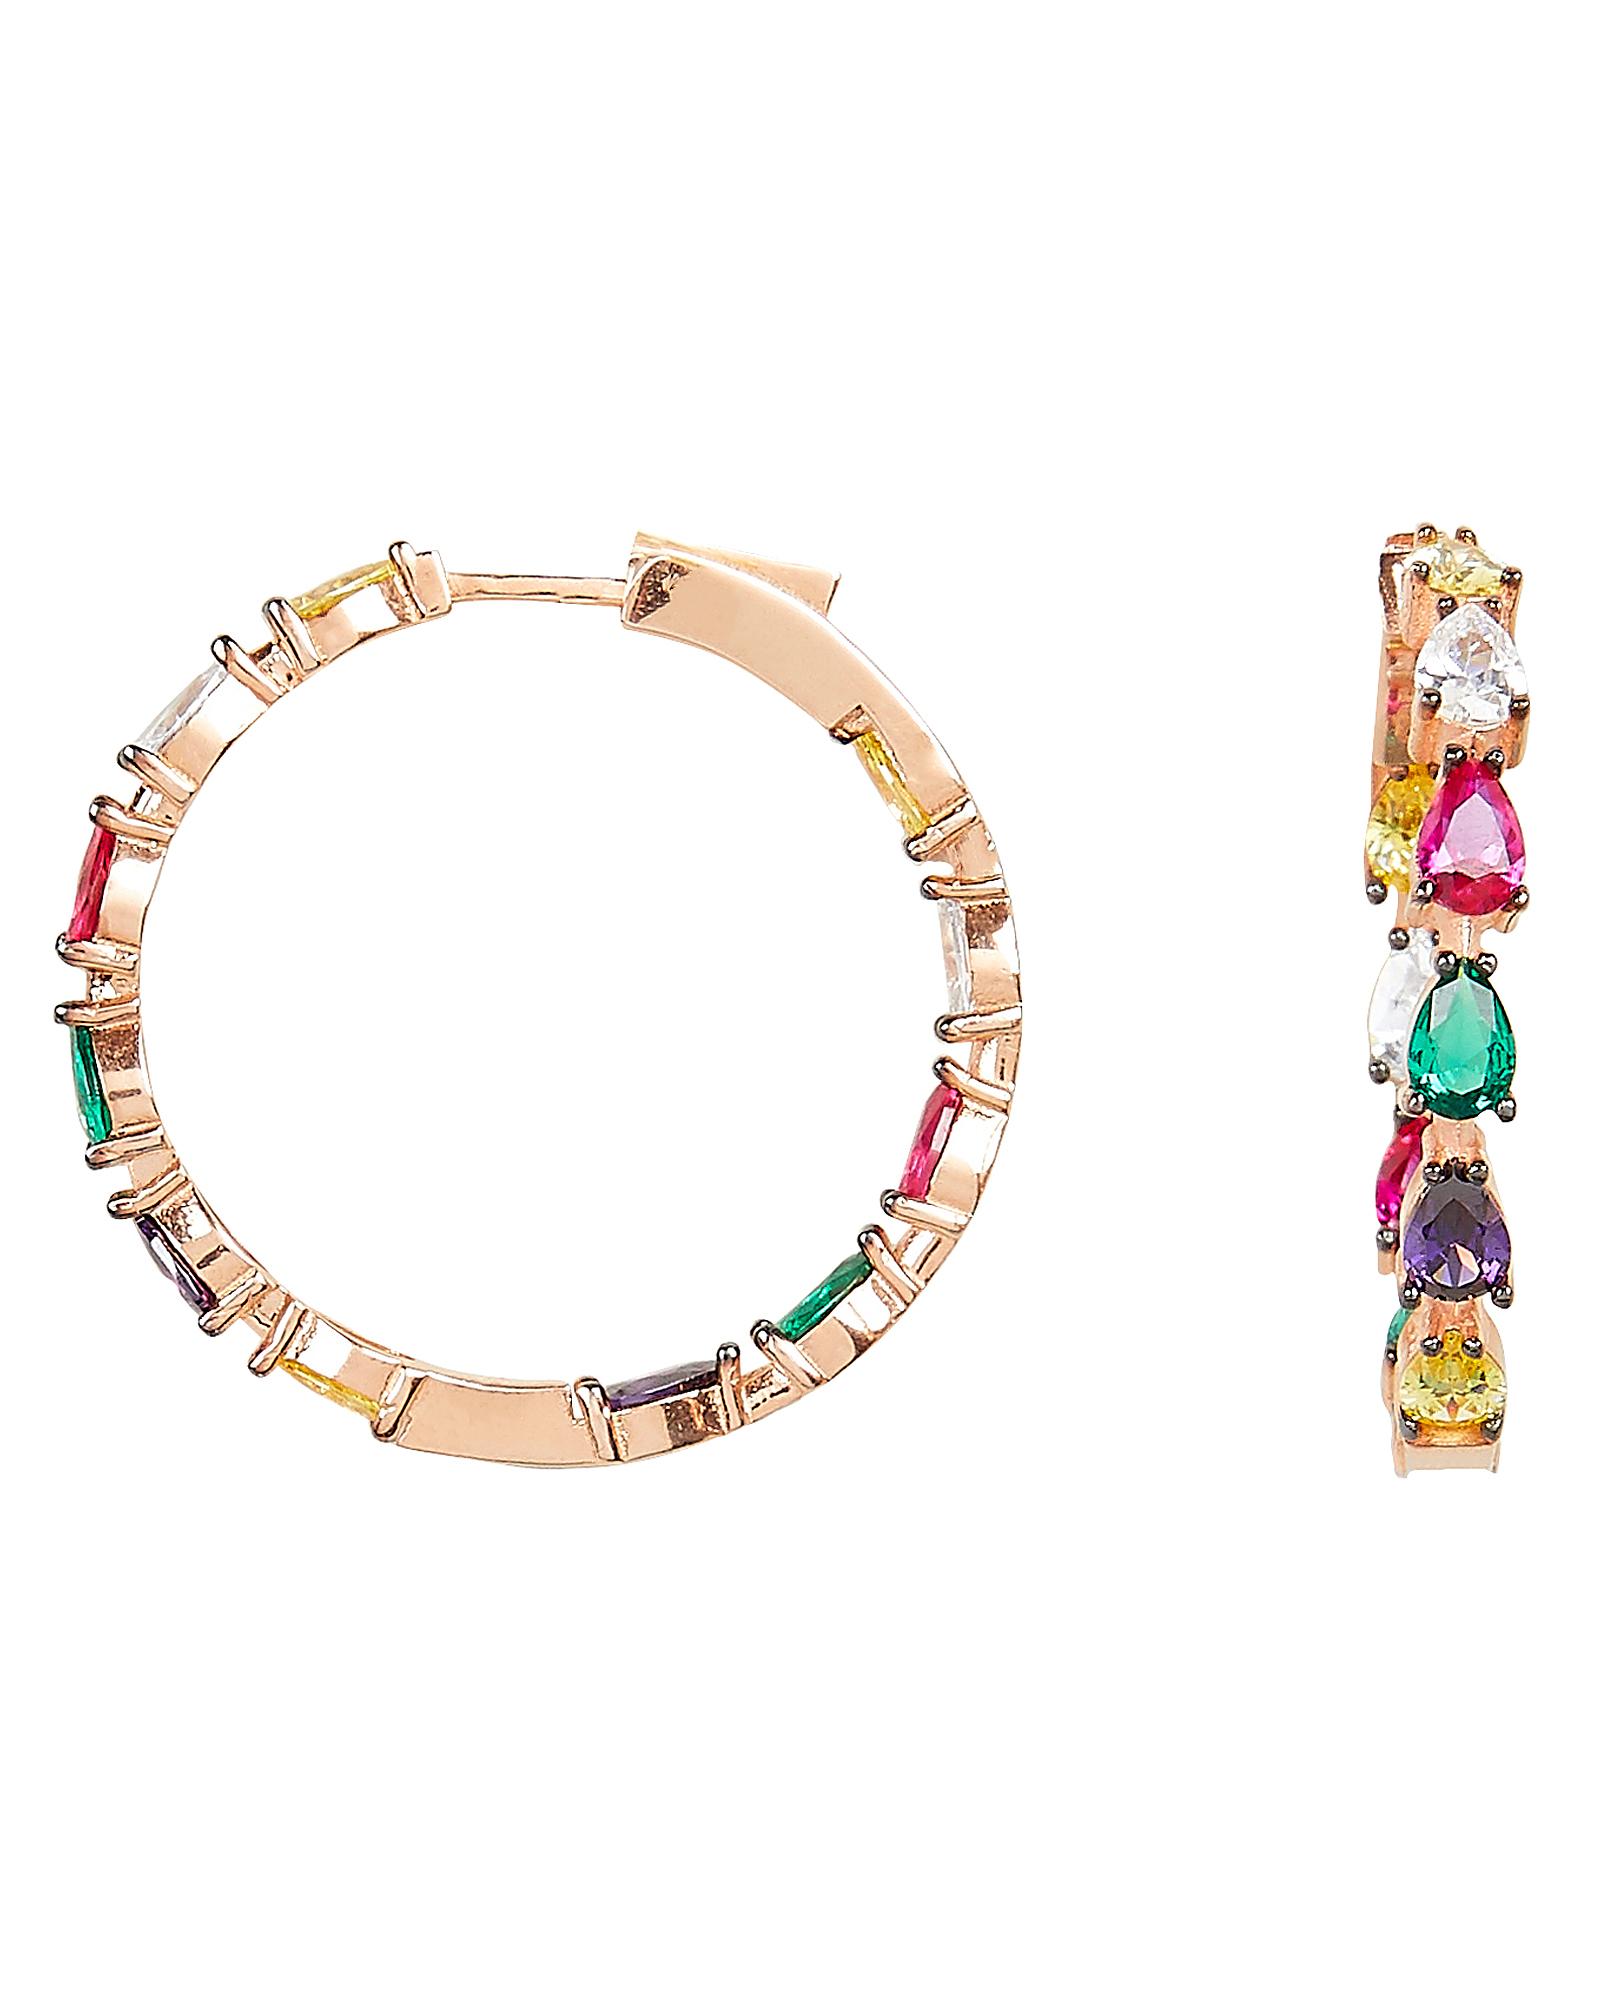 Gil Rainbow Pear Hoops by Nickho Rey